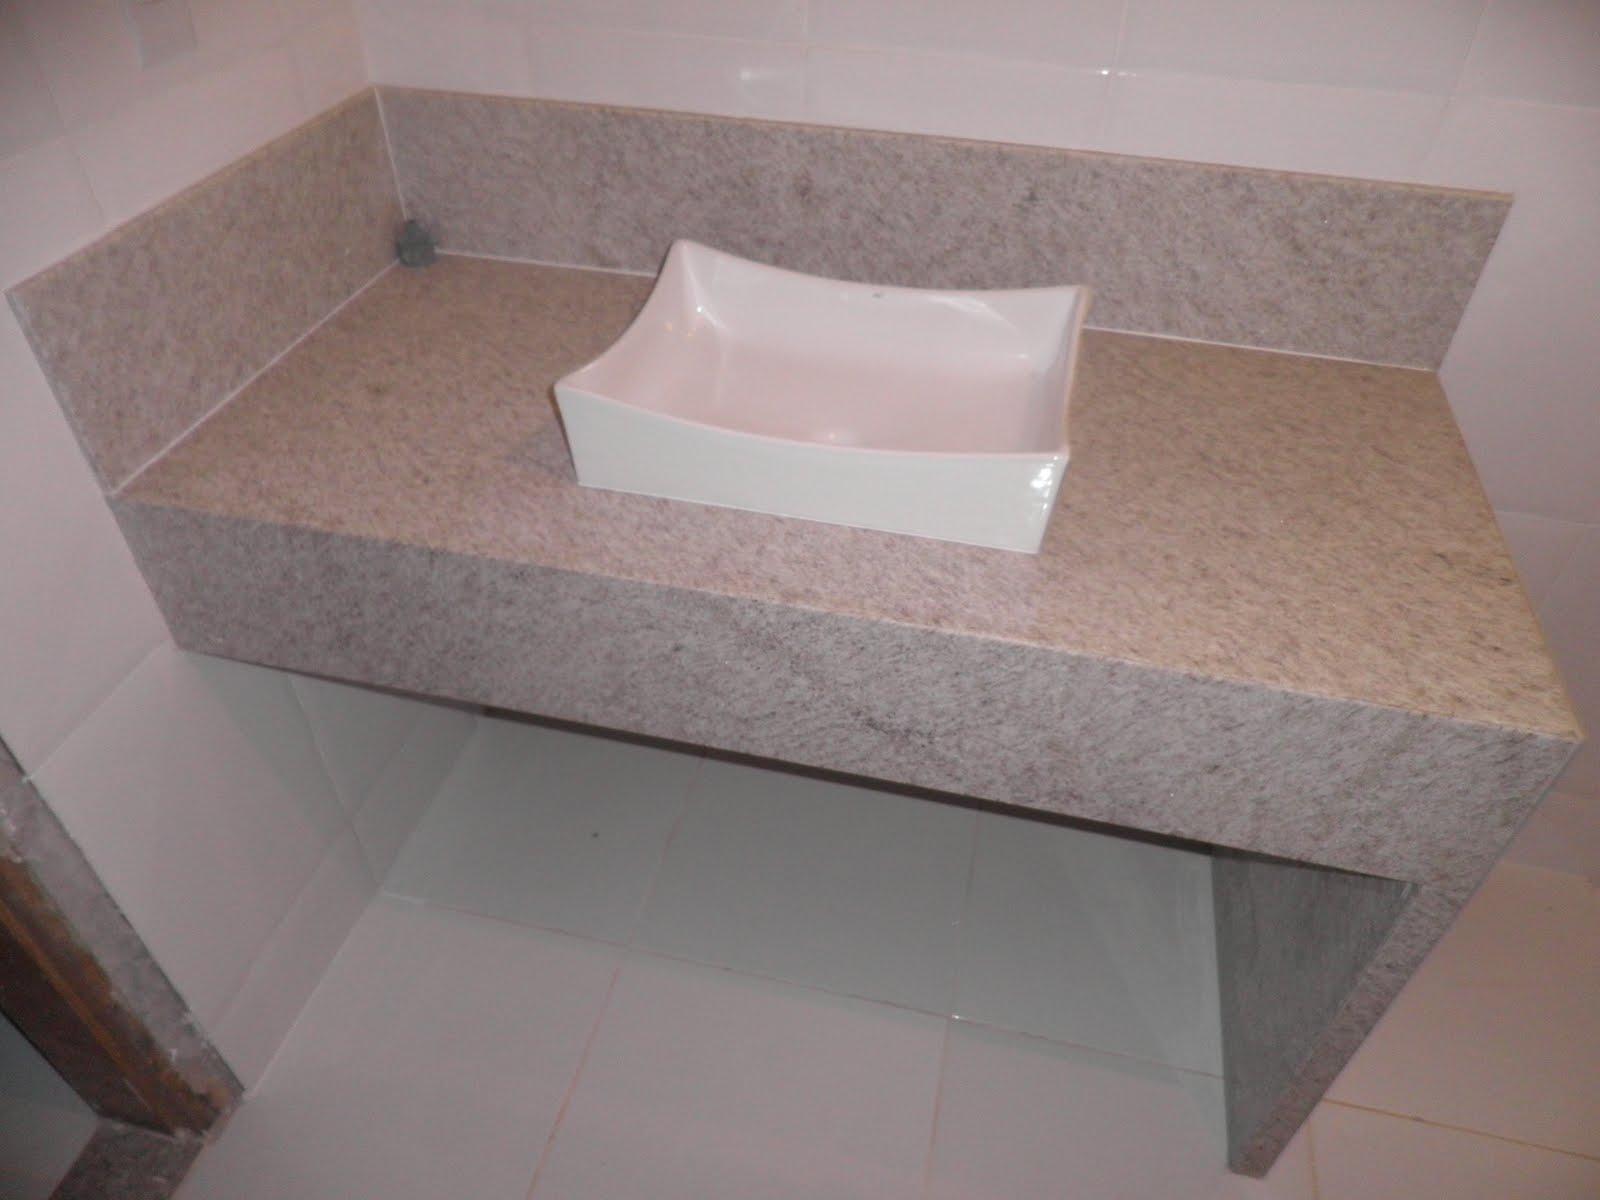 REFORMANDO A DISTANCIA: Bancada do Banheiro Linda!!! #755956 1600x1200